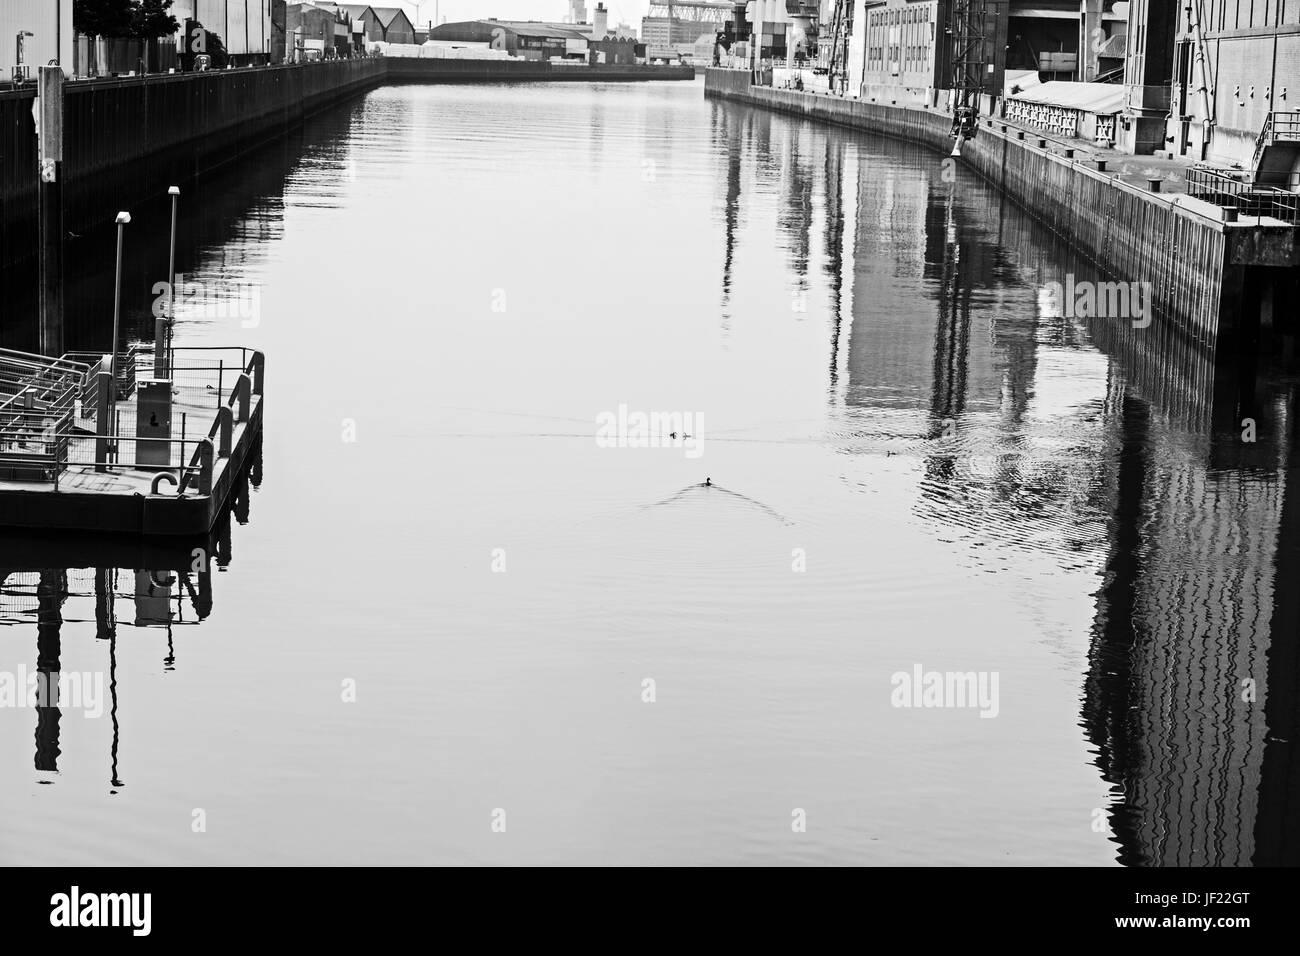 Enten am Europahafen Bremen - Stock Image